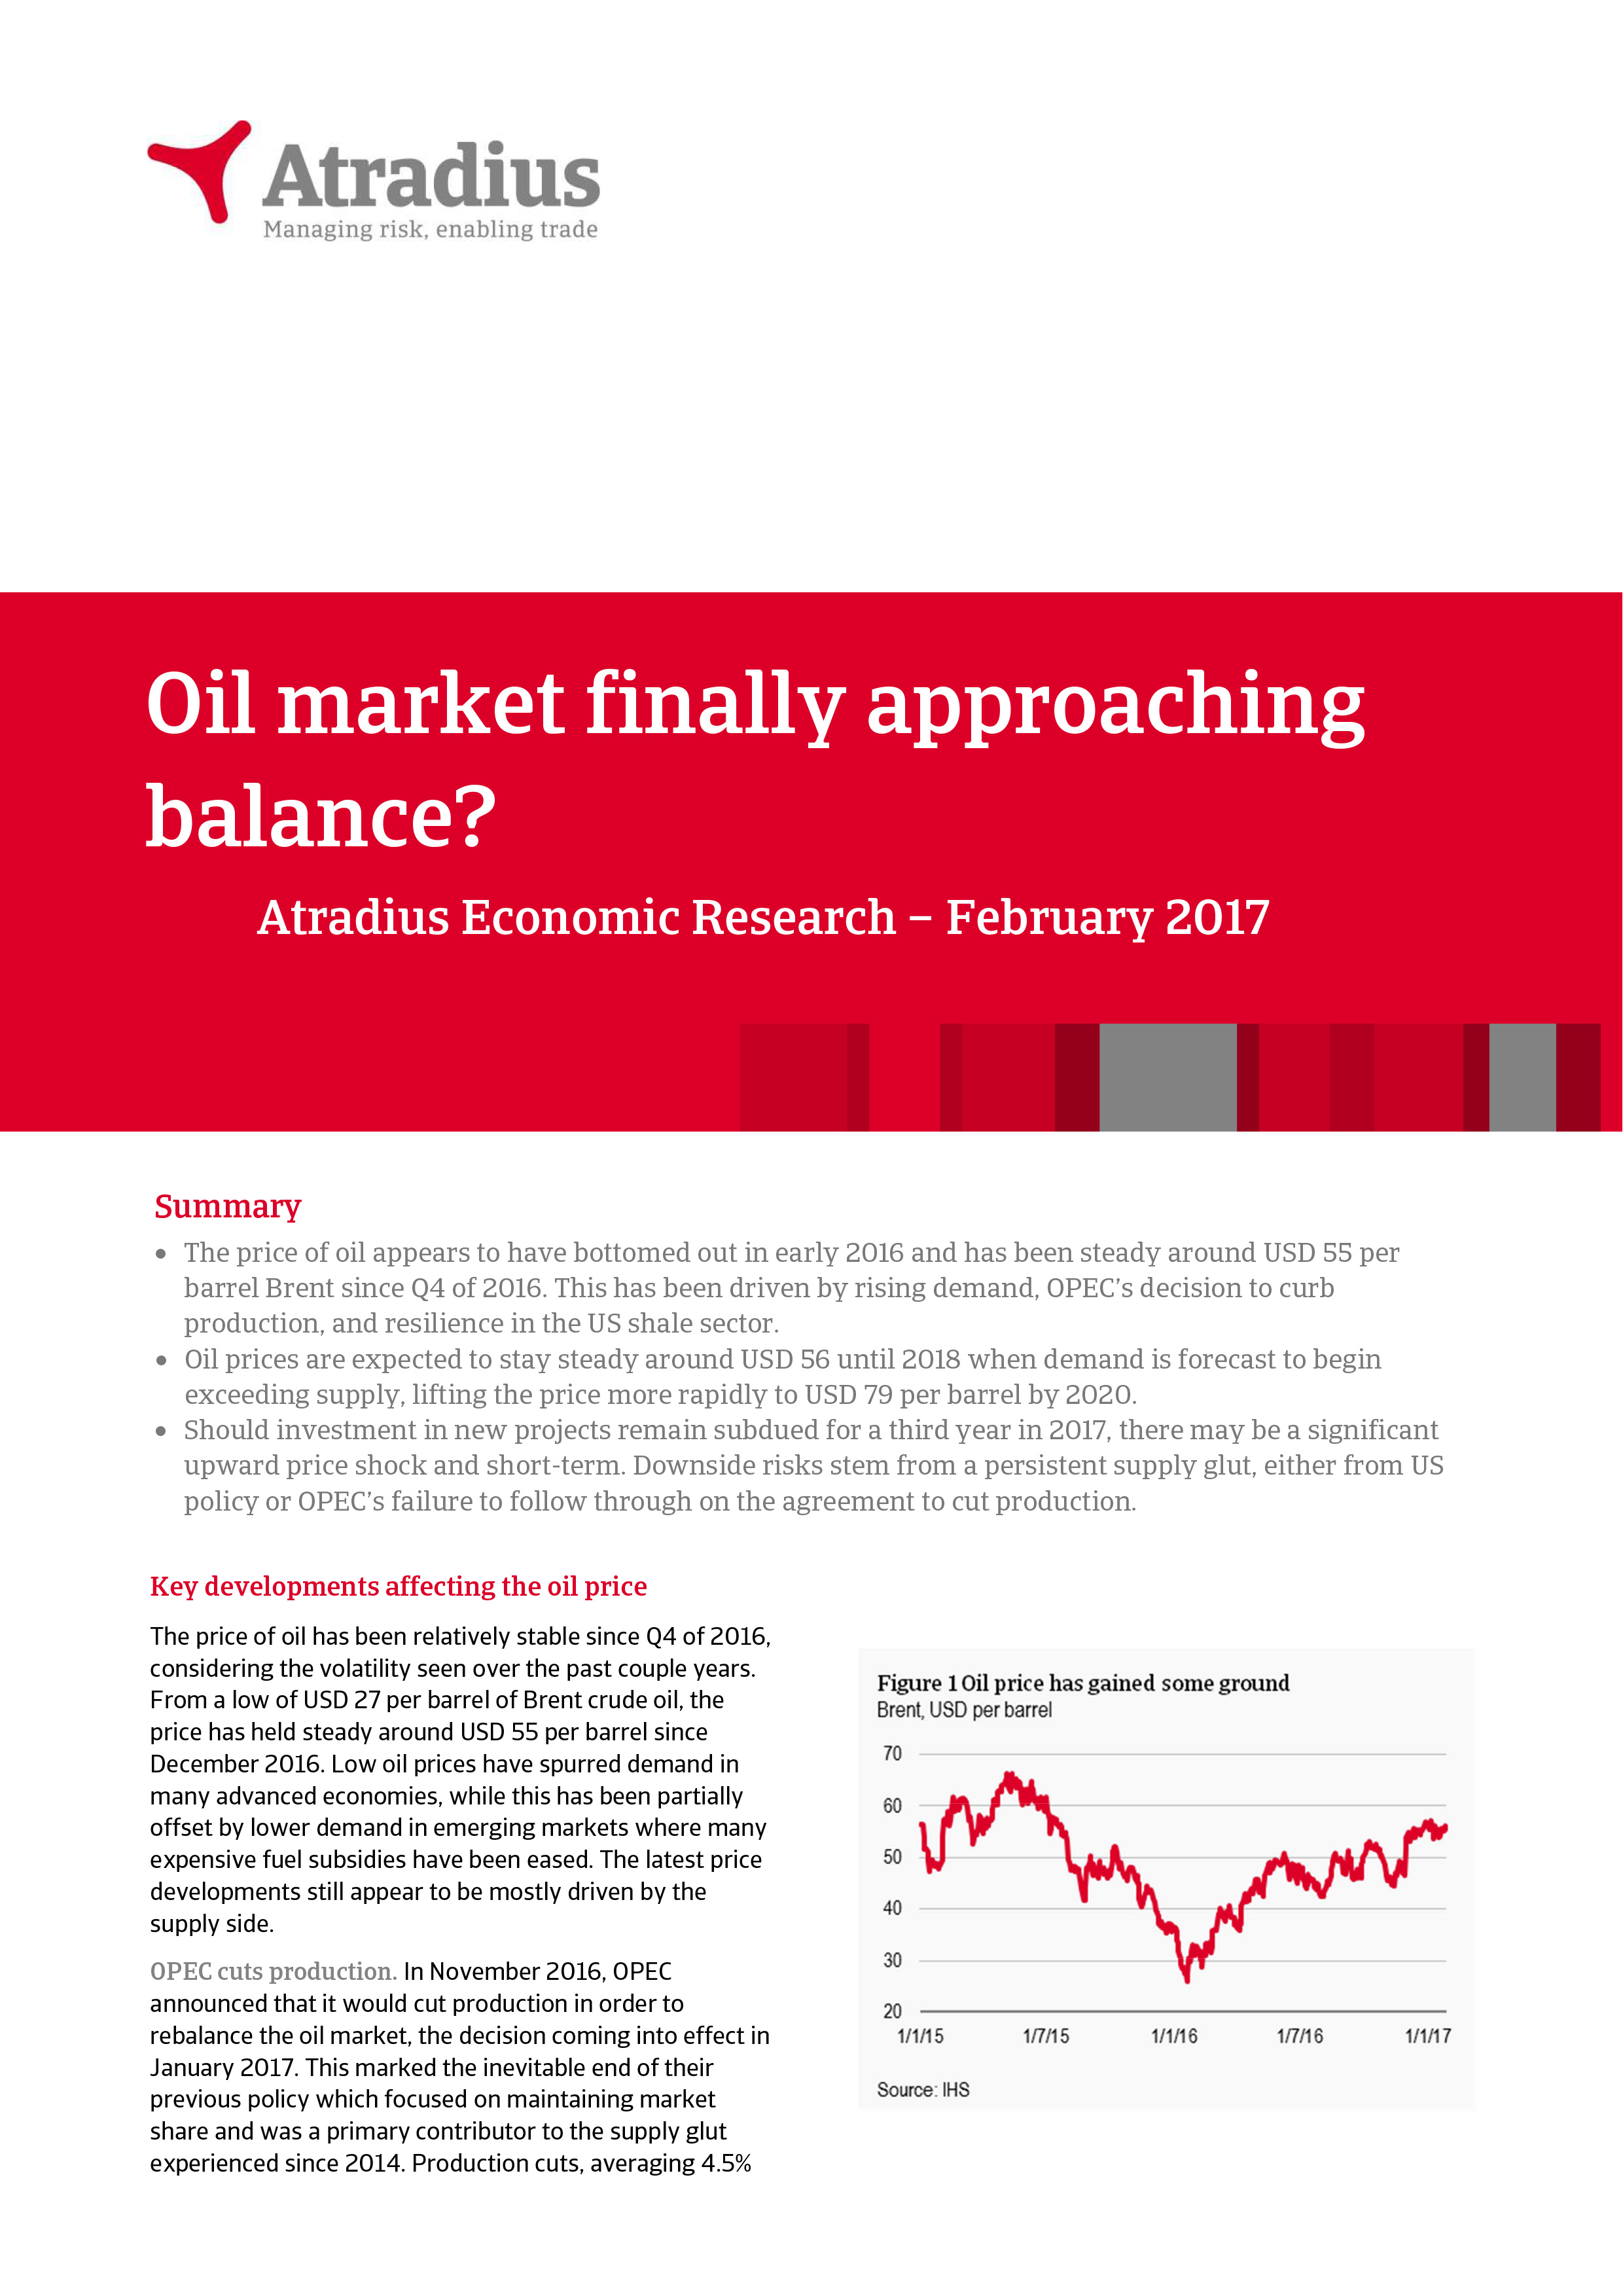 Atradius_Economic_Research_Oil_market_update_Feb_2017_EN01